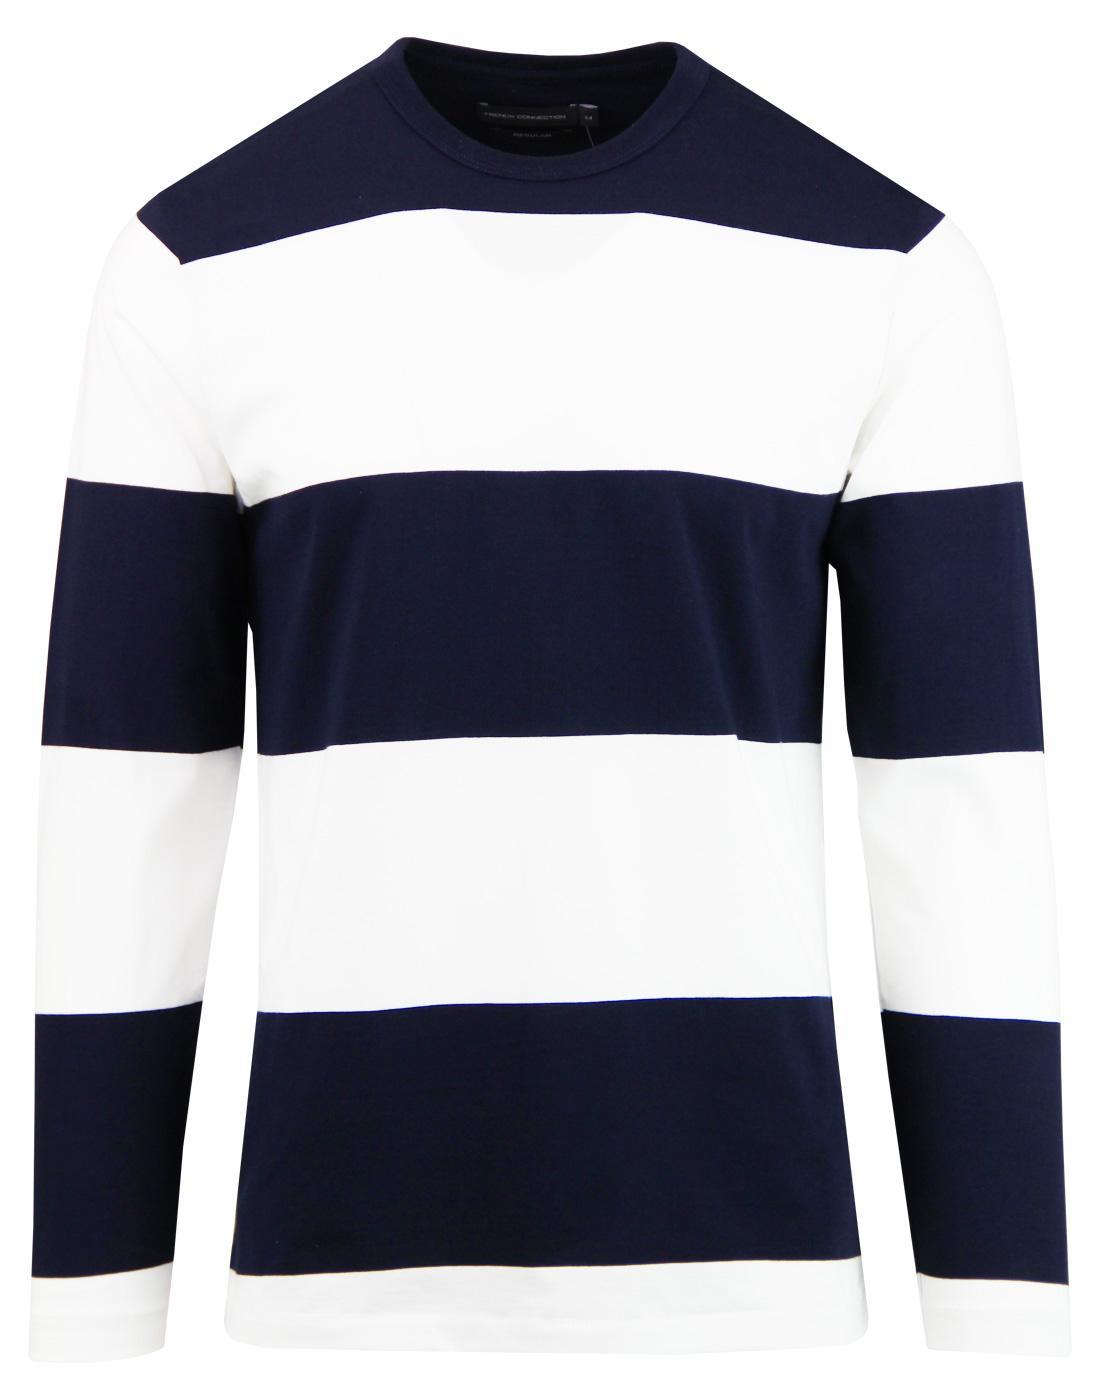 FRENCH CONNECTION Retro Mod Block Stripe T-Shirt